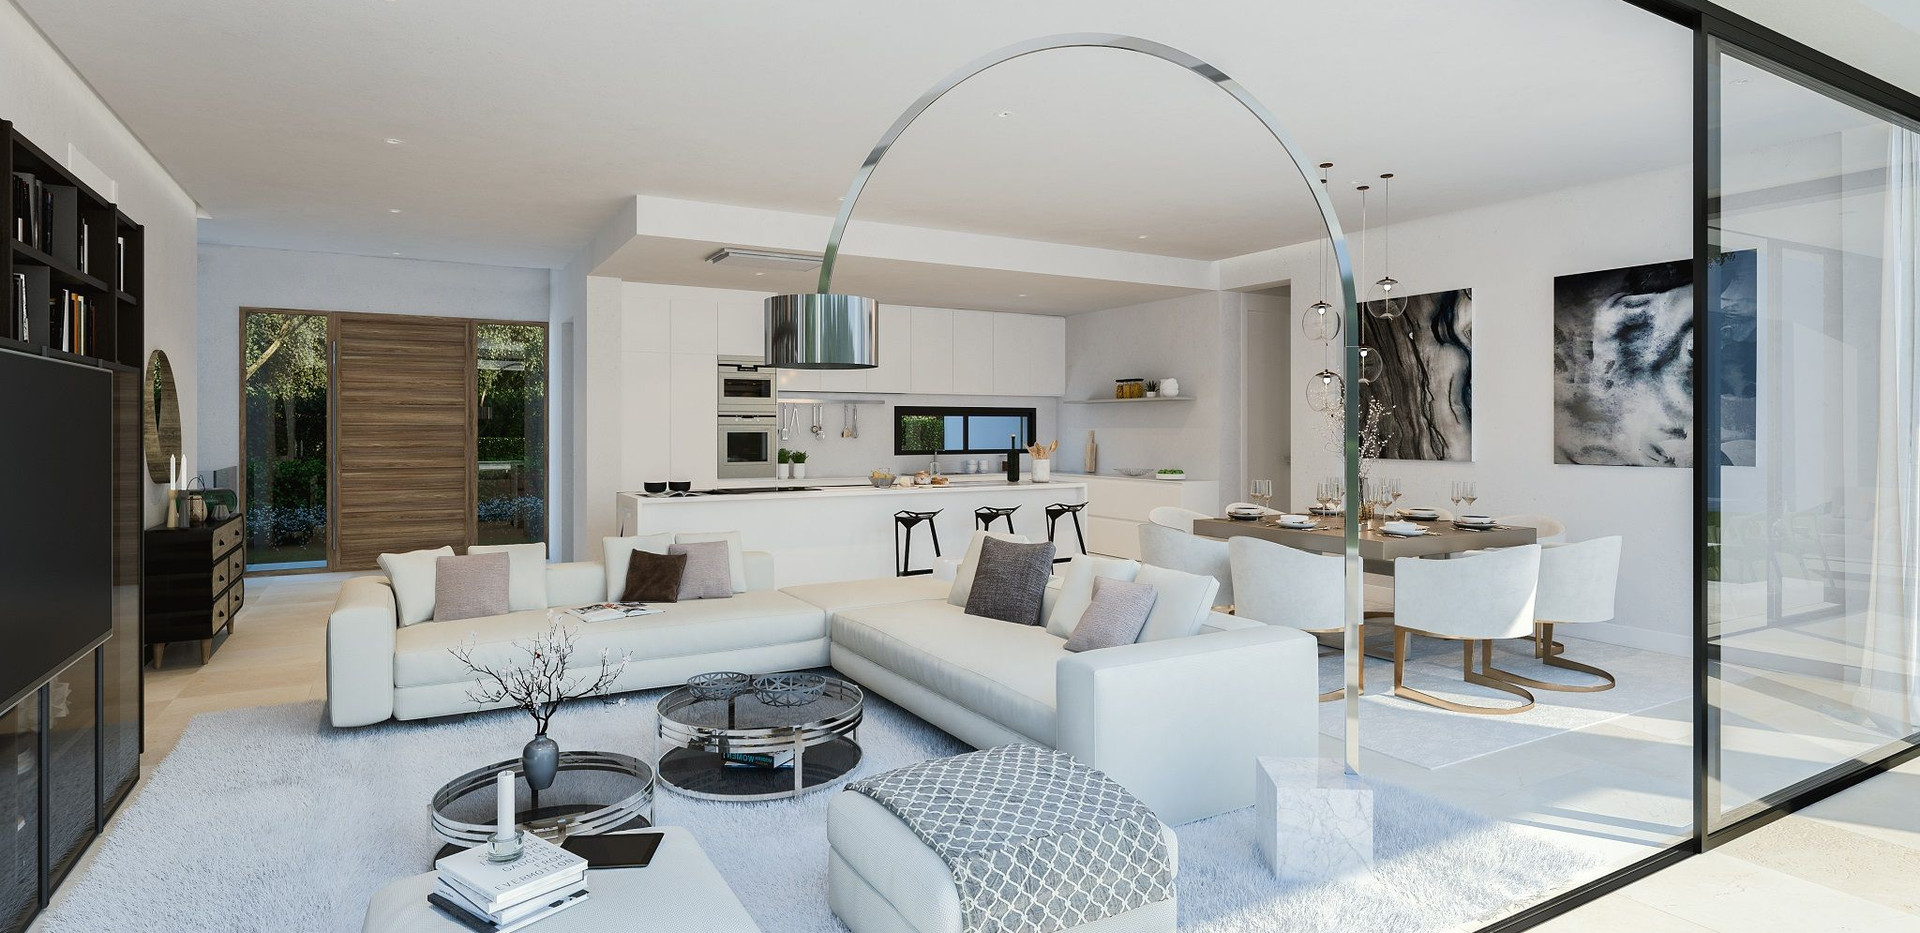 CaboRoyale-Livingroom-Type-C-1.jpg